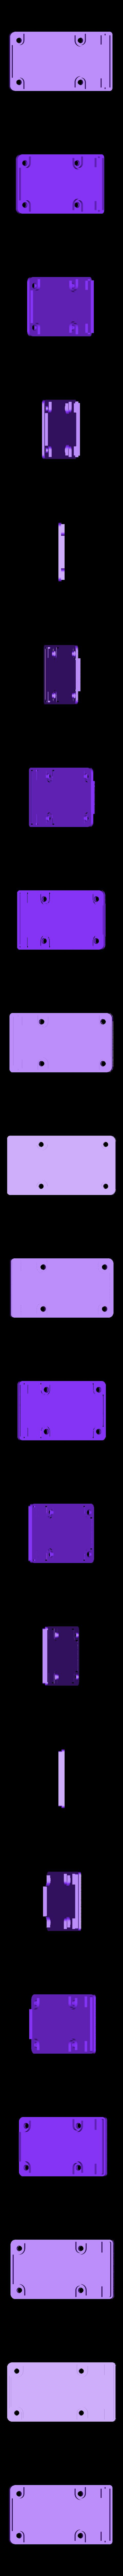 triser-cover.stl Download free STL file NeoPixel LED Truck Riser for Skateboard Longboard • 3D printable object, Adafruit